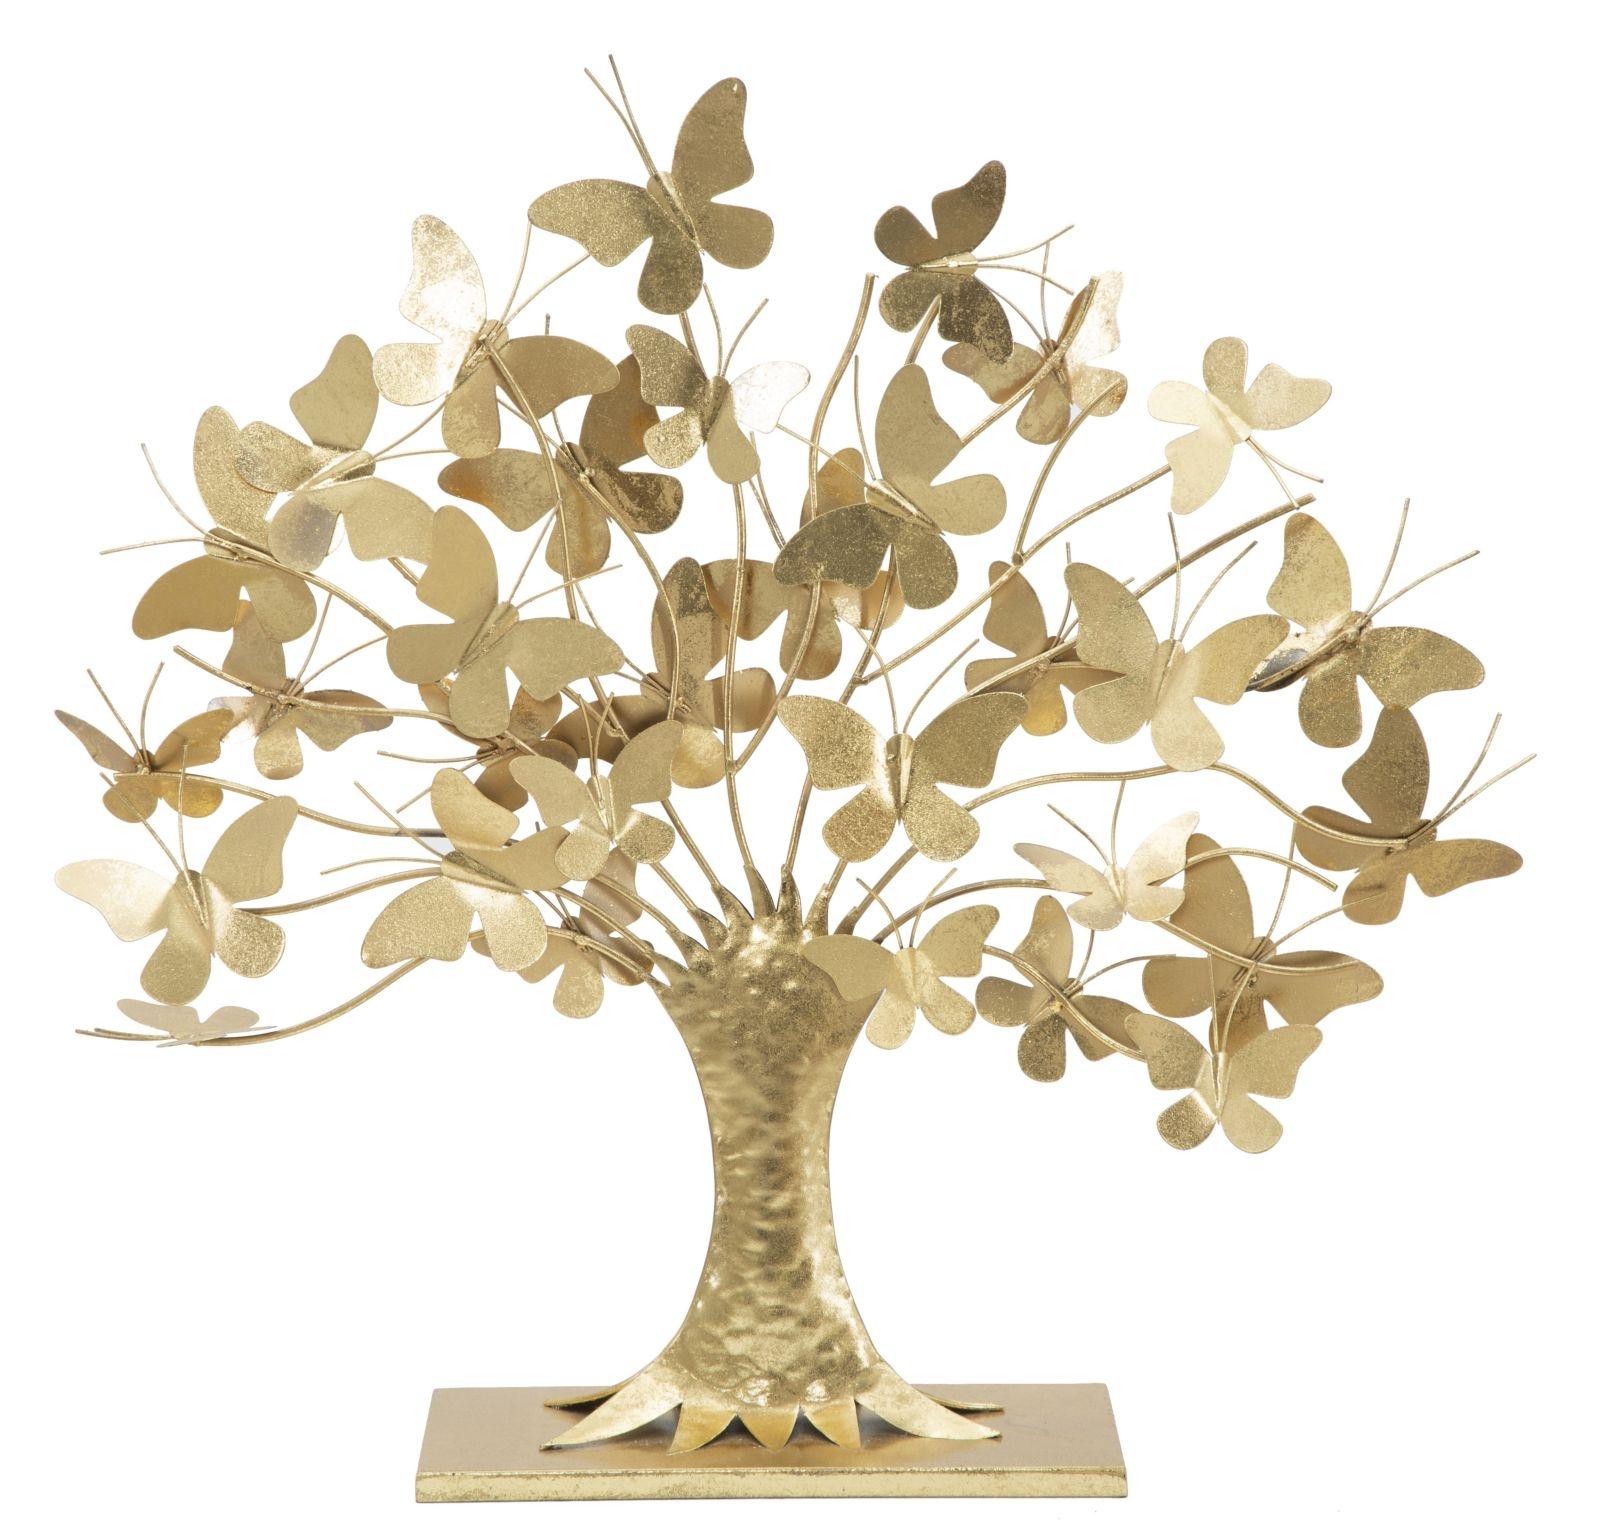 Decoratiune metalica Butterfly Tree Auriu, l63xA13xH60 cm imagine